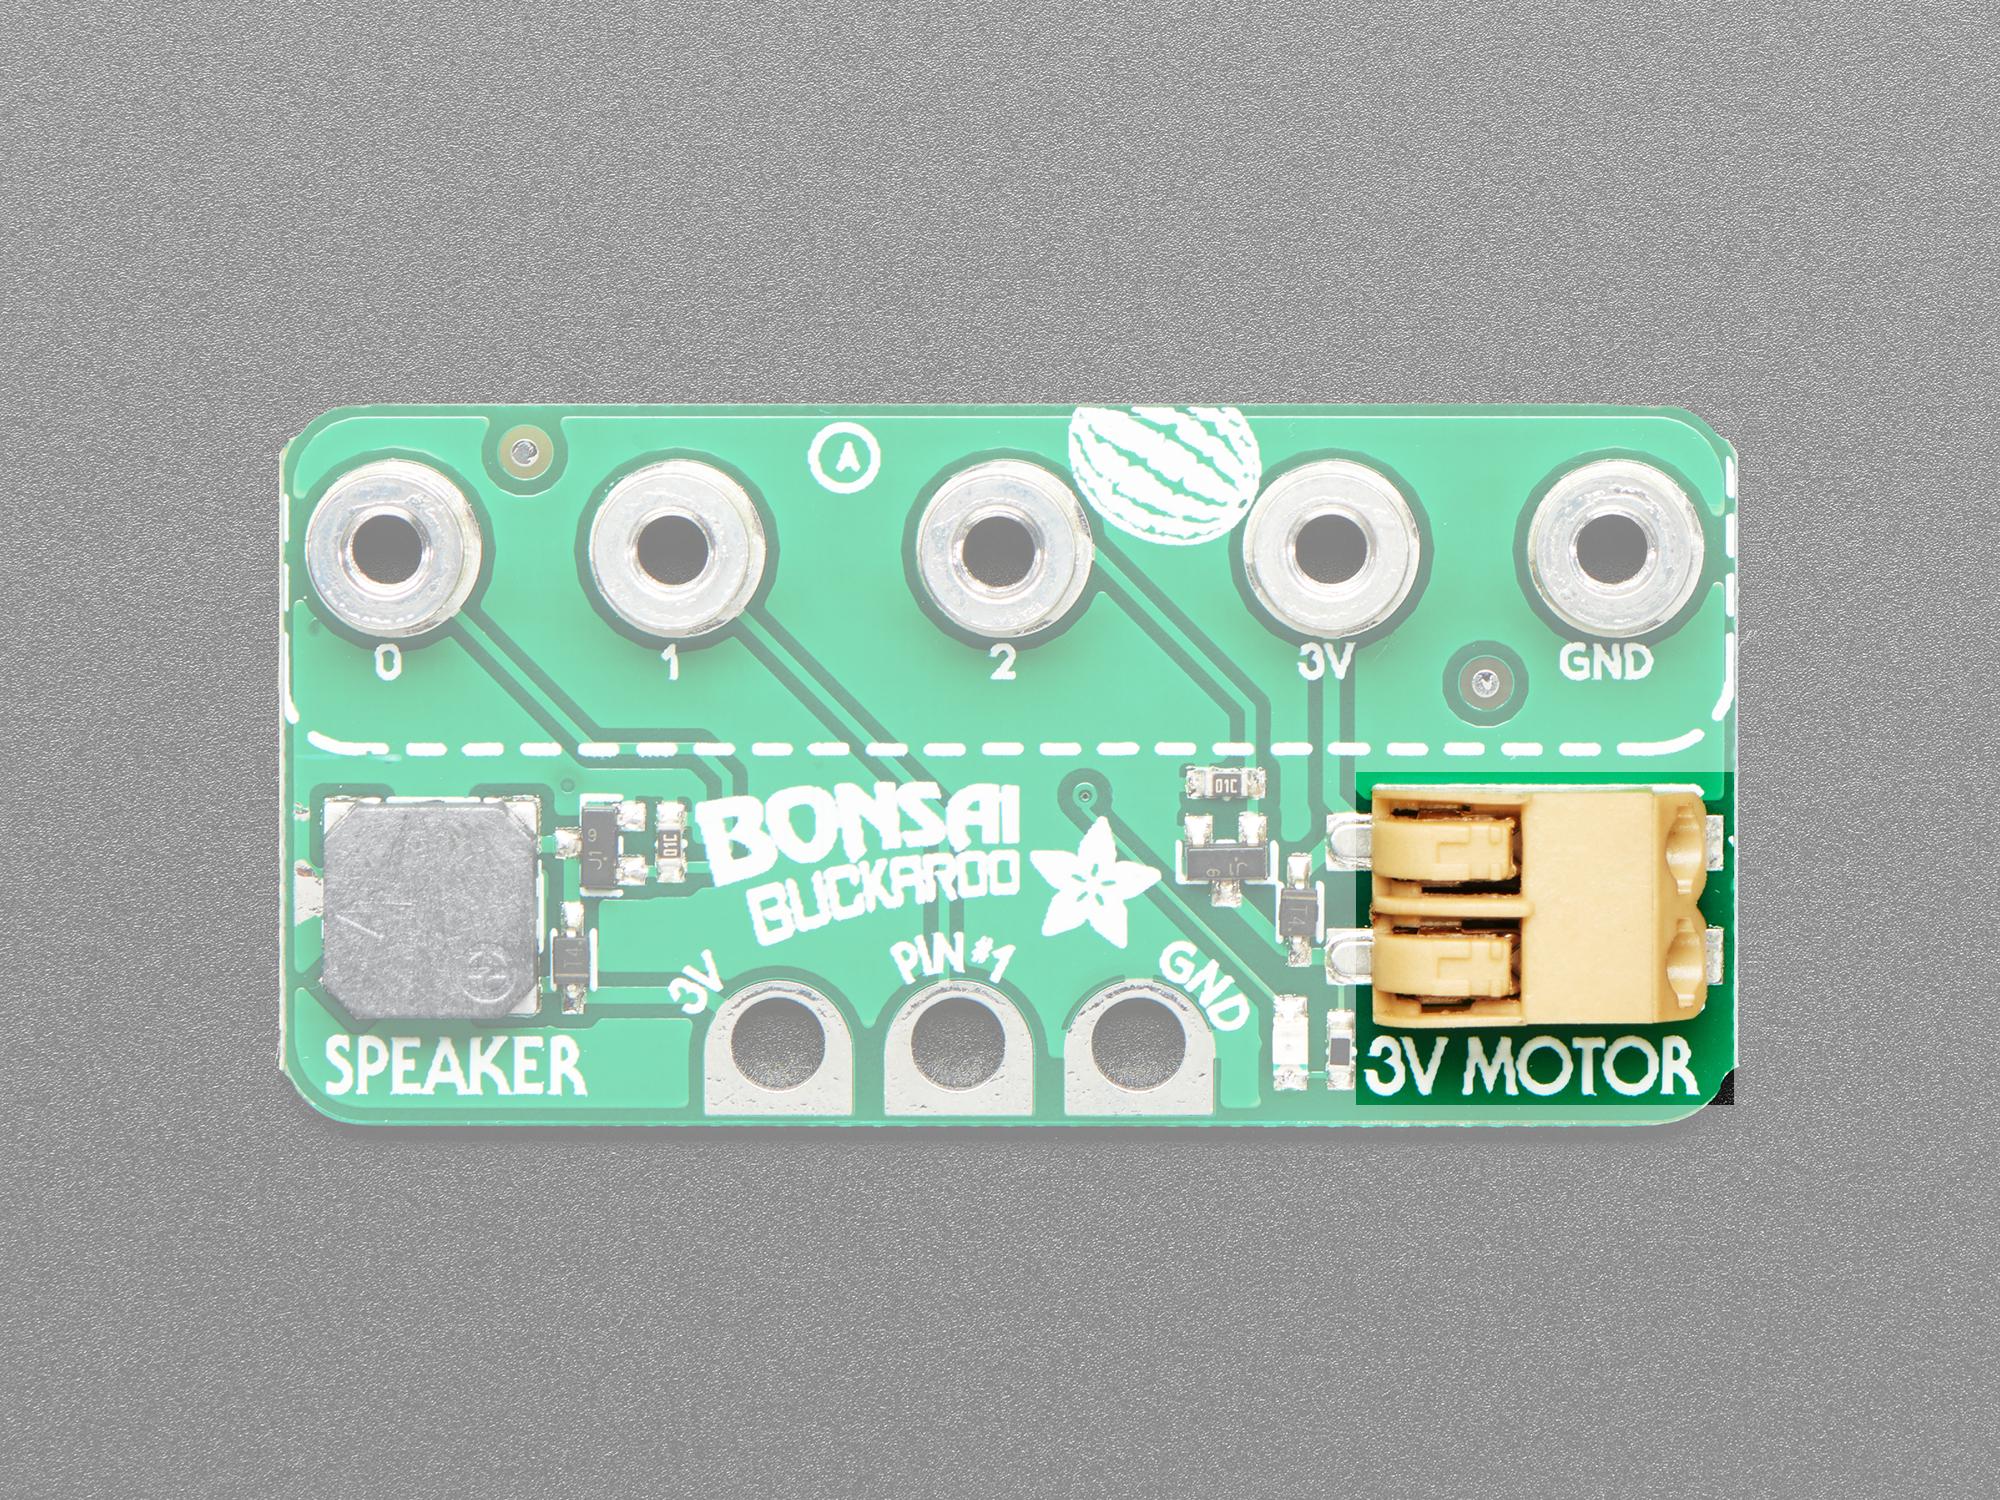 sensors_BB_pinouts_motor_terminal.jpg